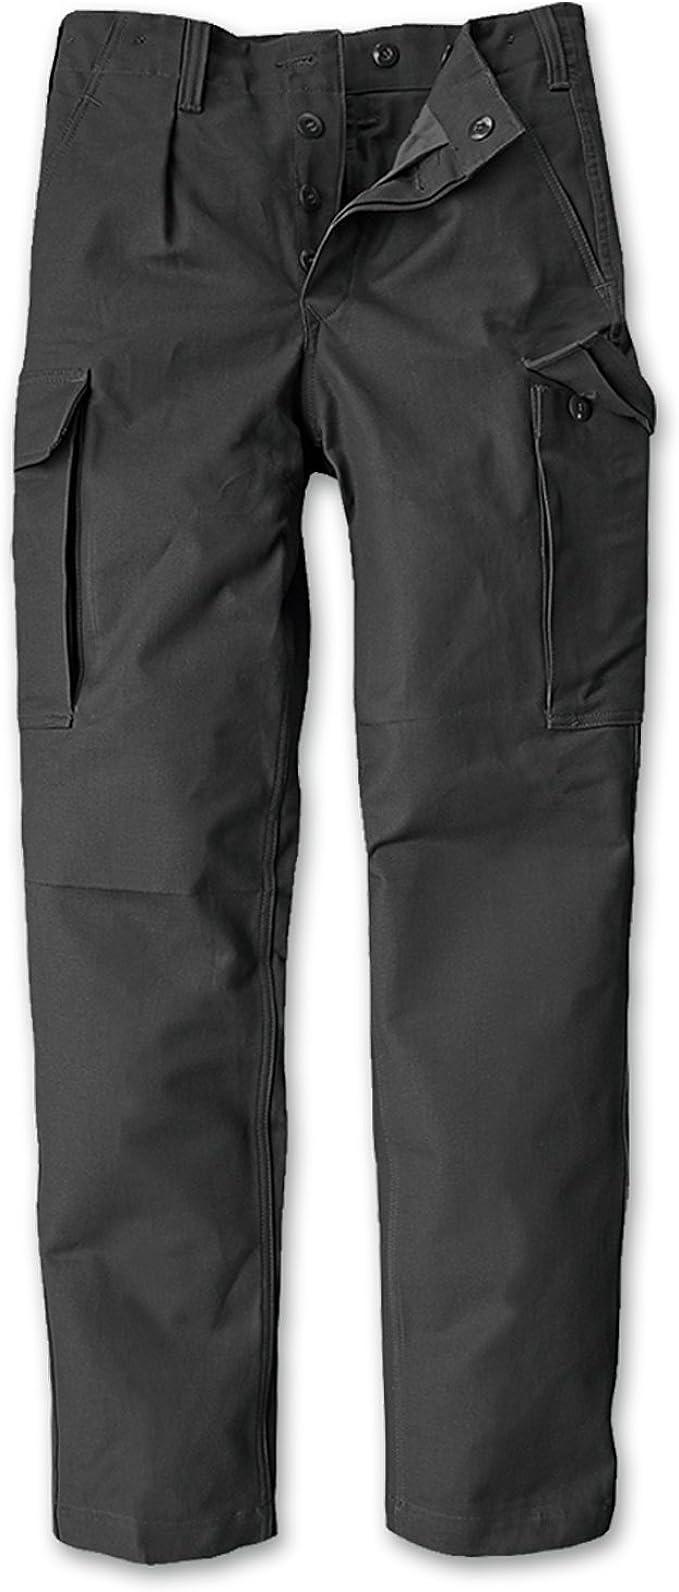 "Original BW Moleskin Trousers /""Washed/"" Field Pants Moleskin Trousers Olive Black Outdoor"